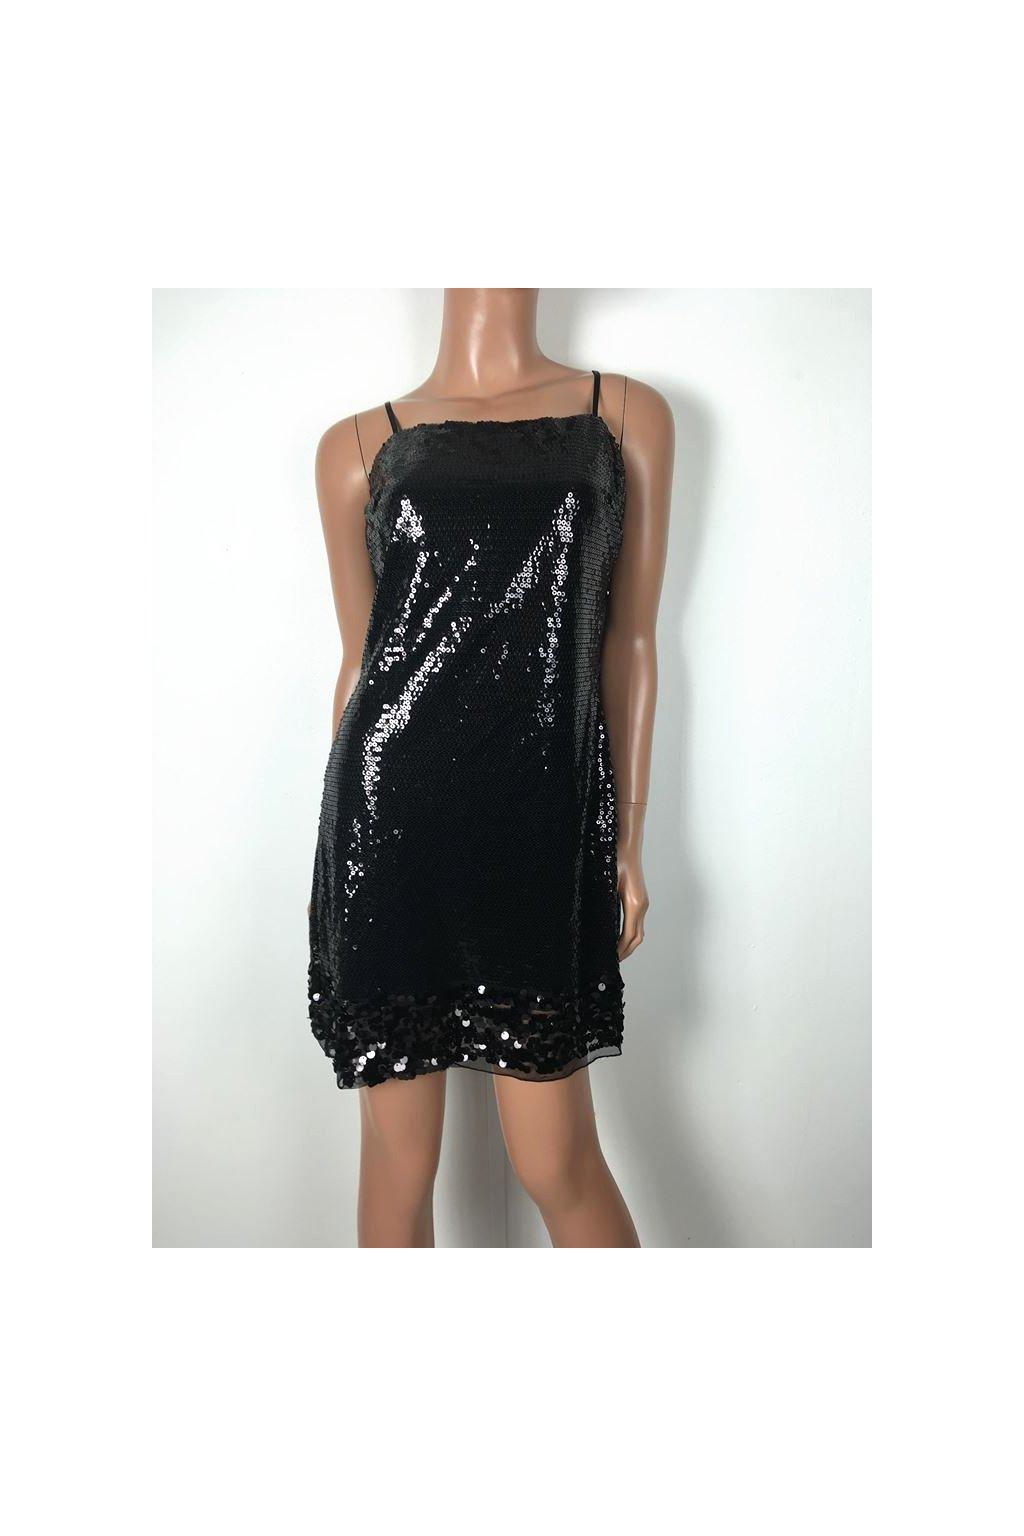 Šaty černé s flitry Rub y Rox vel. S / uk 6